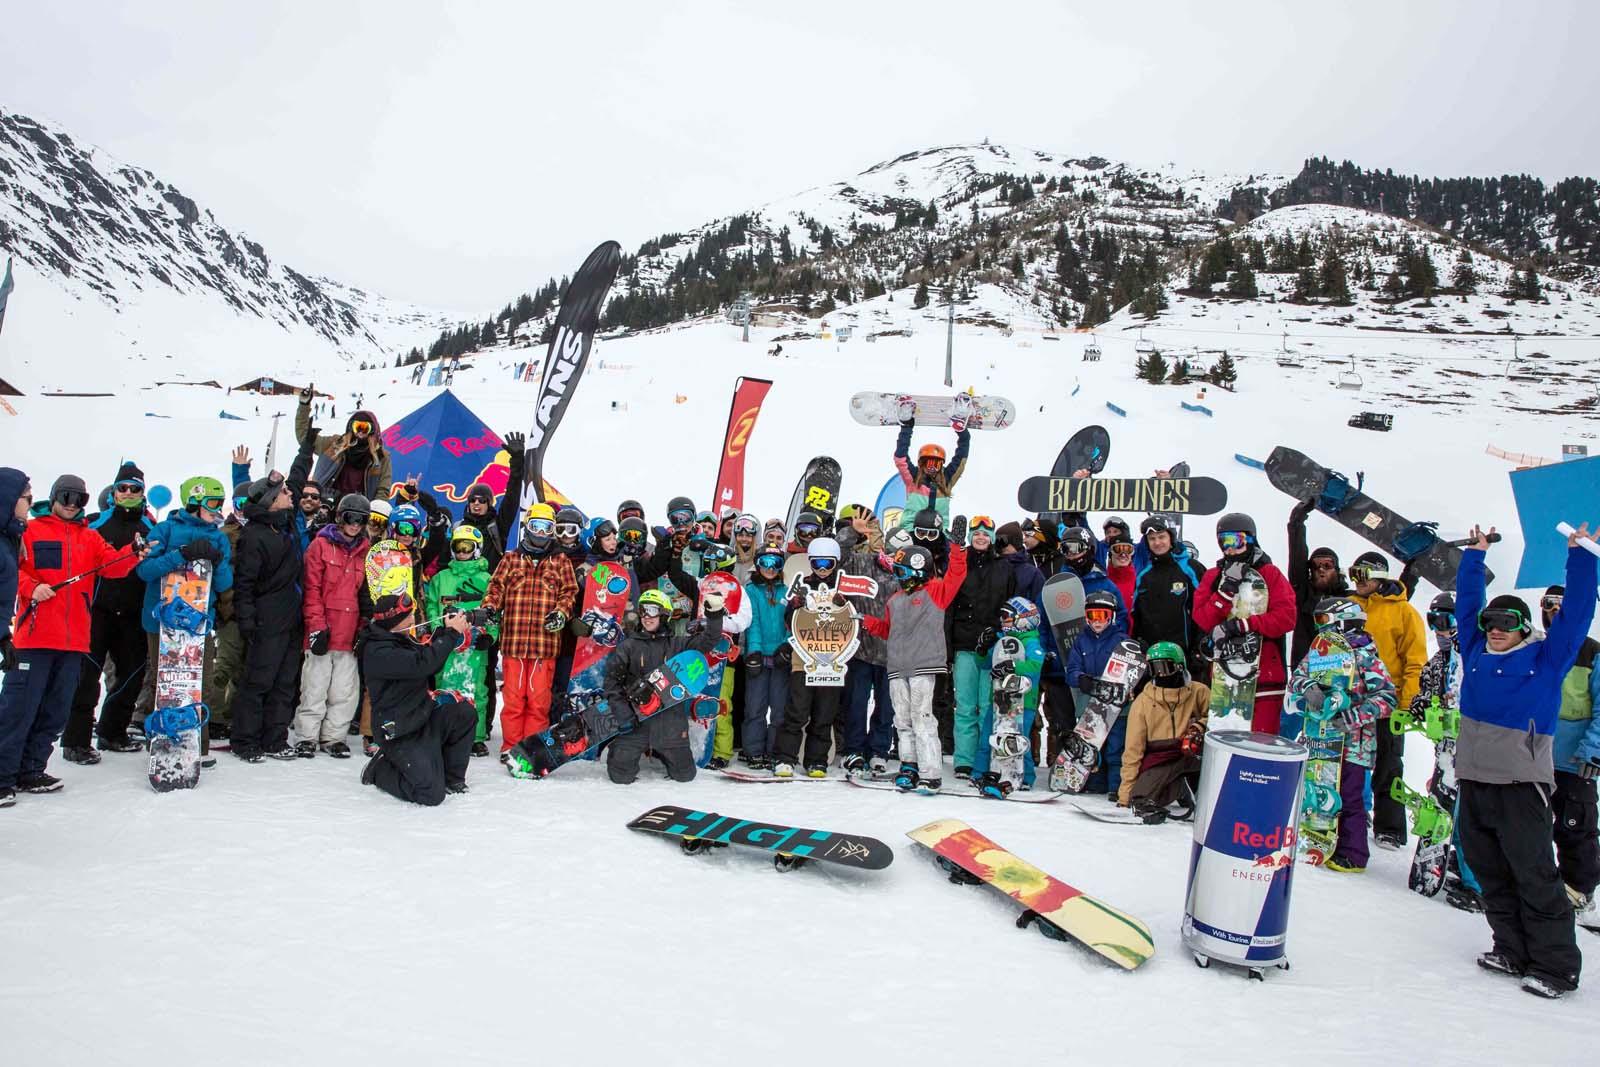 Zillertal Välley Rälley hosted by Ride Snowboards 2015 / 2016 - Foto: Matt McHattie